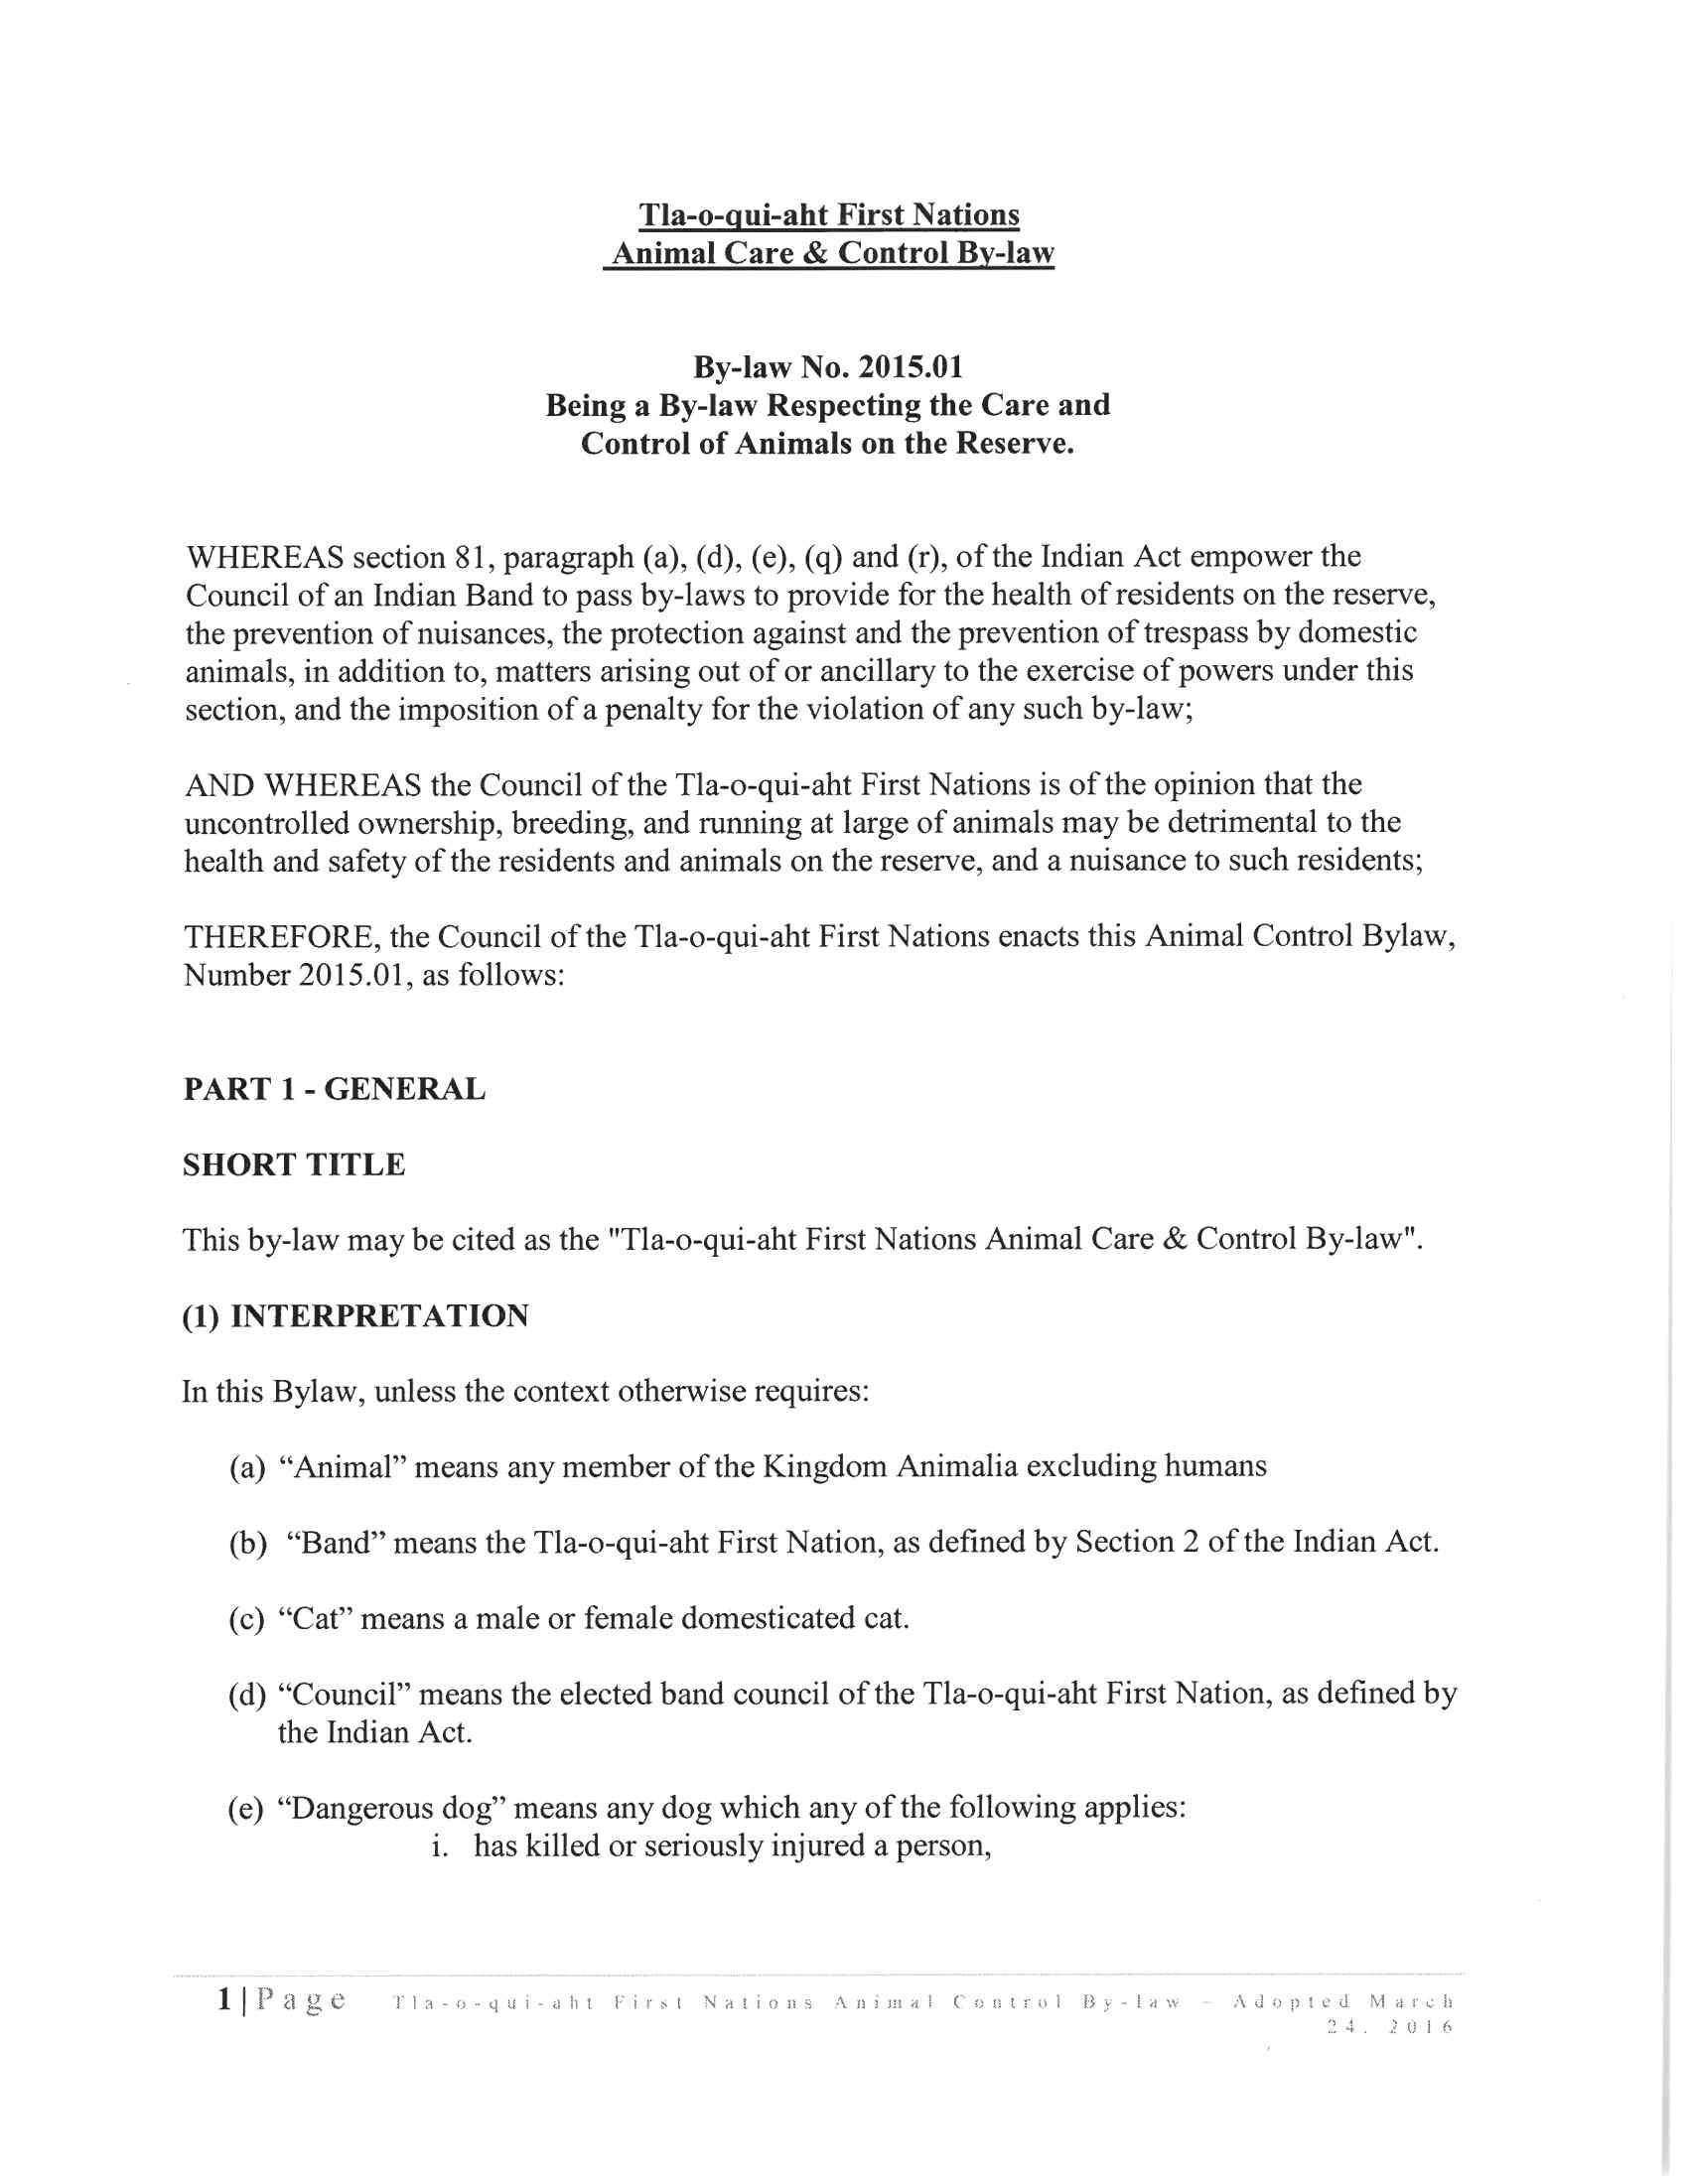 TFN Bulletin Apr 6-2016_Page_23.jpg